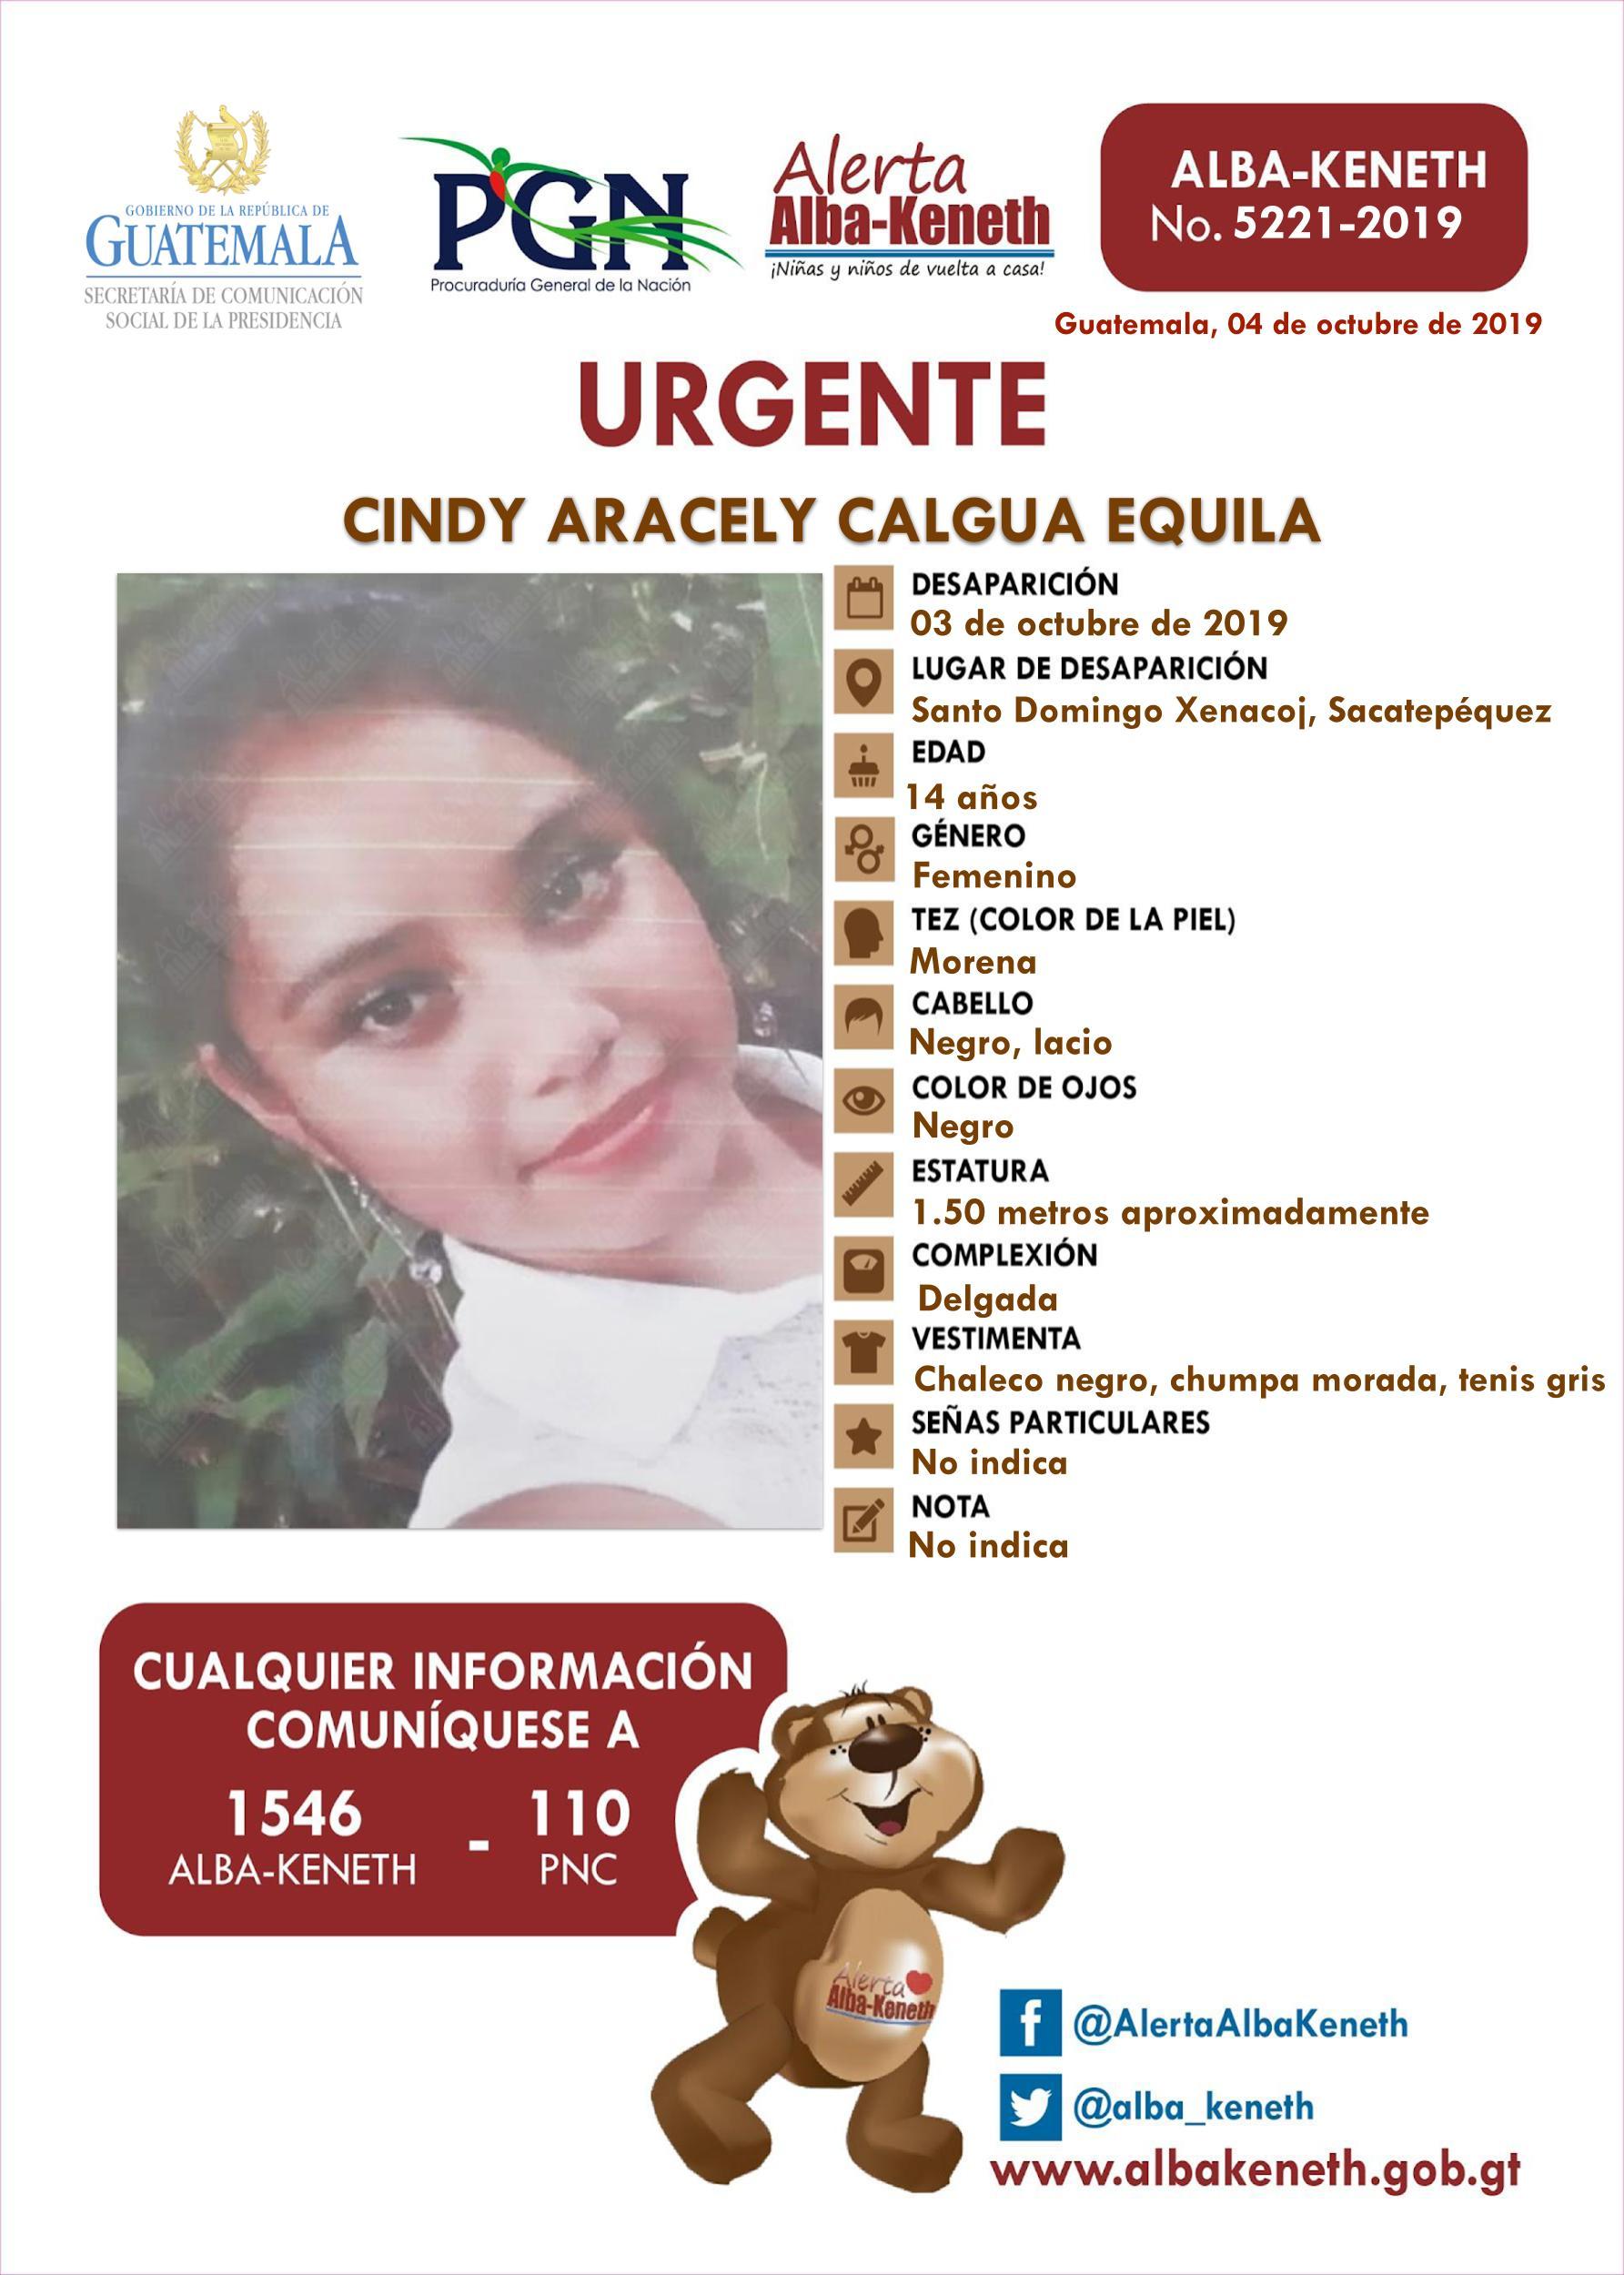 Cindy Aracely Calgua Equila